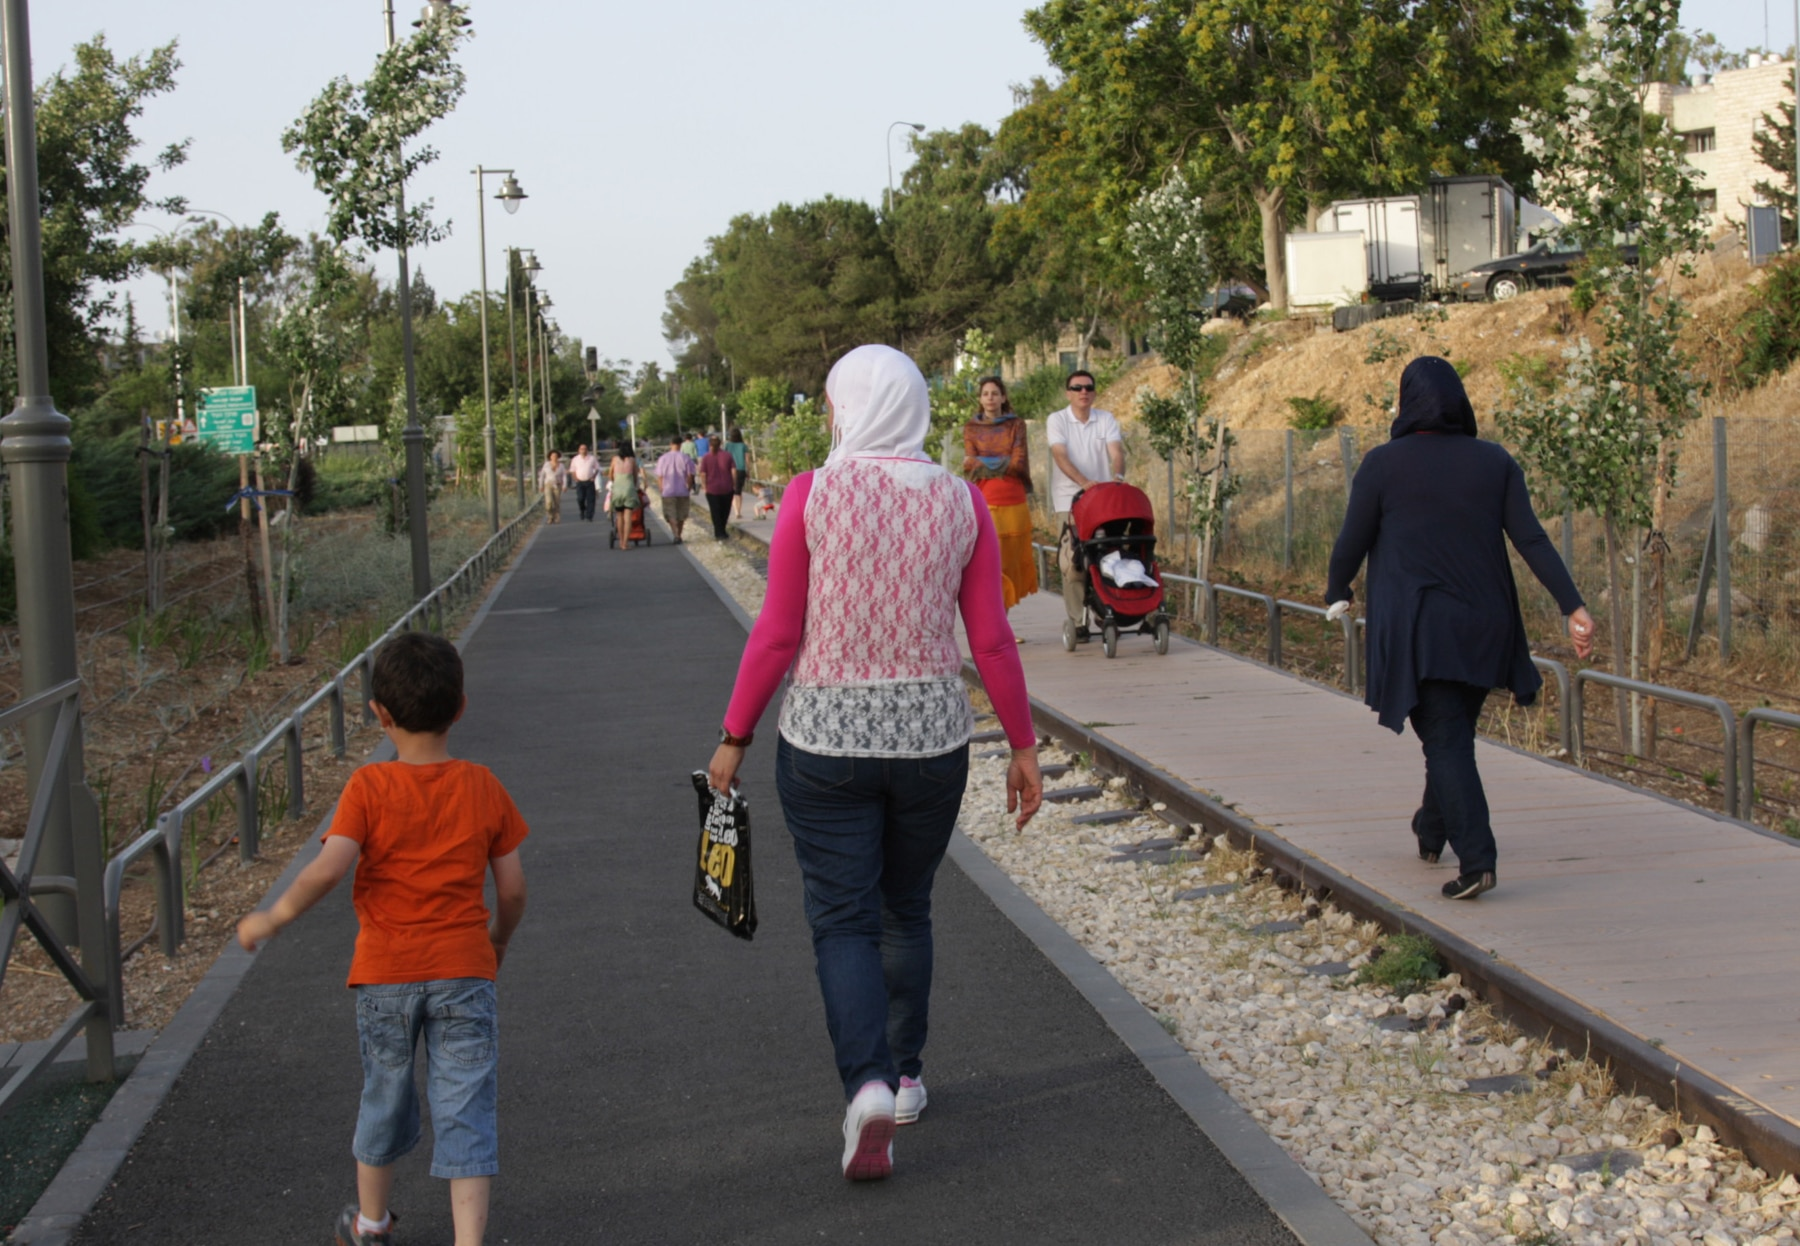 People walking down a promenade (© Shmuel Bar-Am)